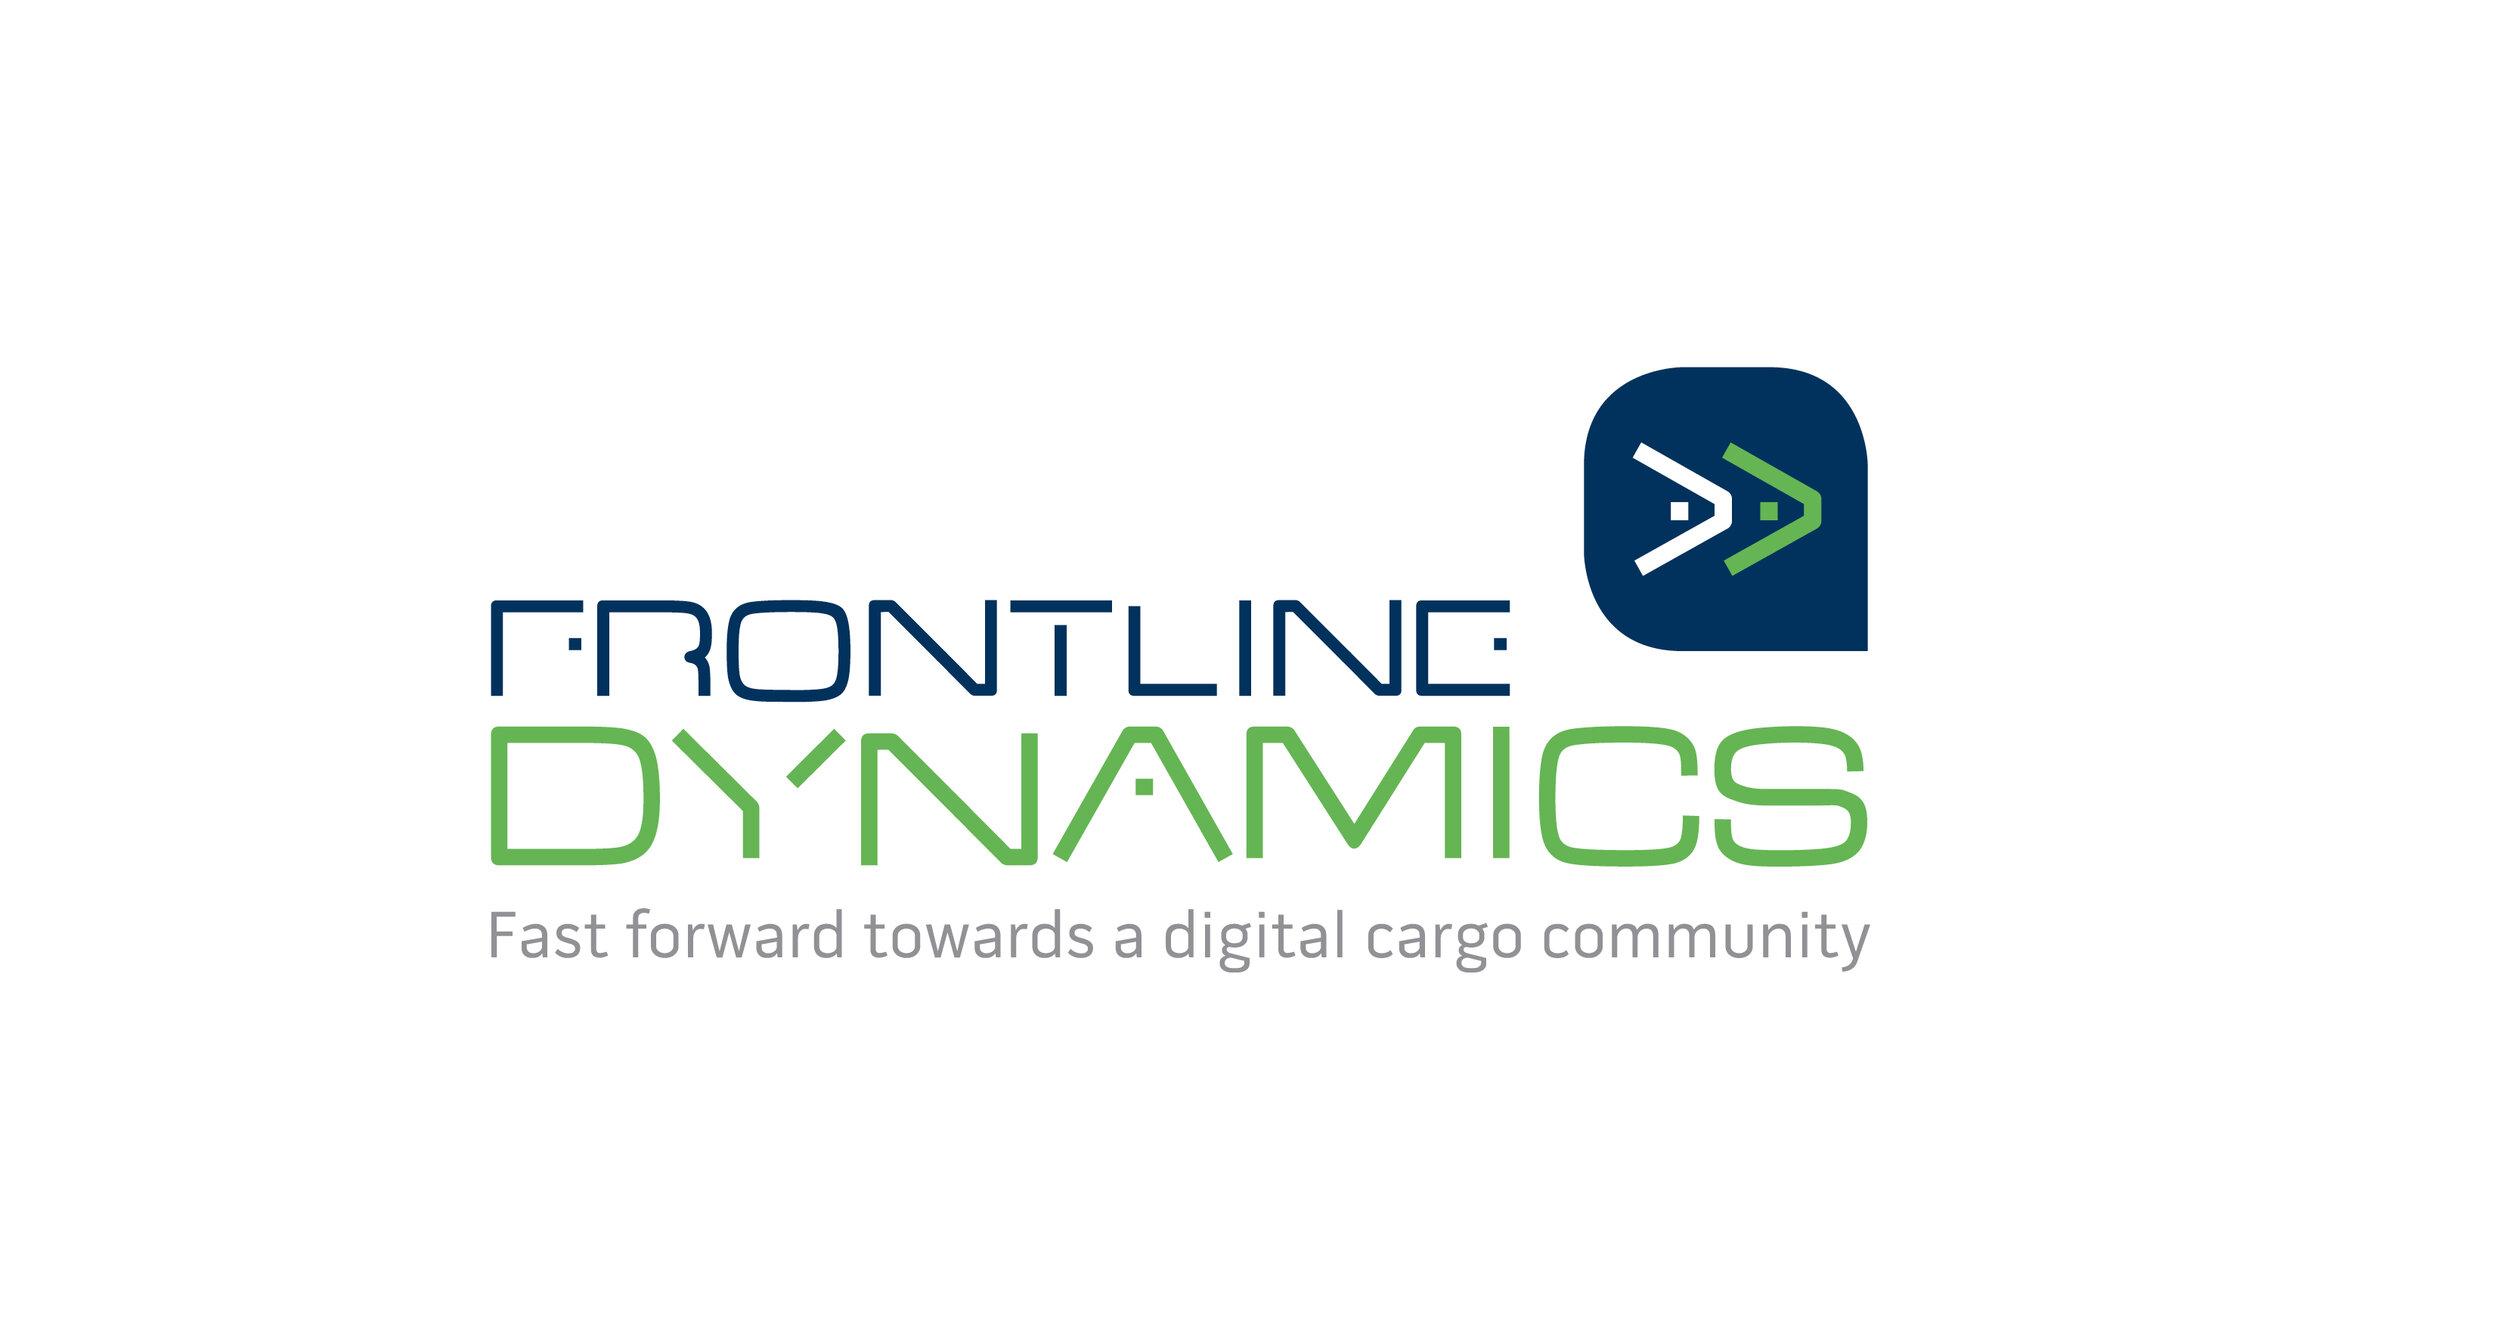 Digital air-cargo logistic platform